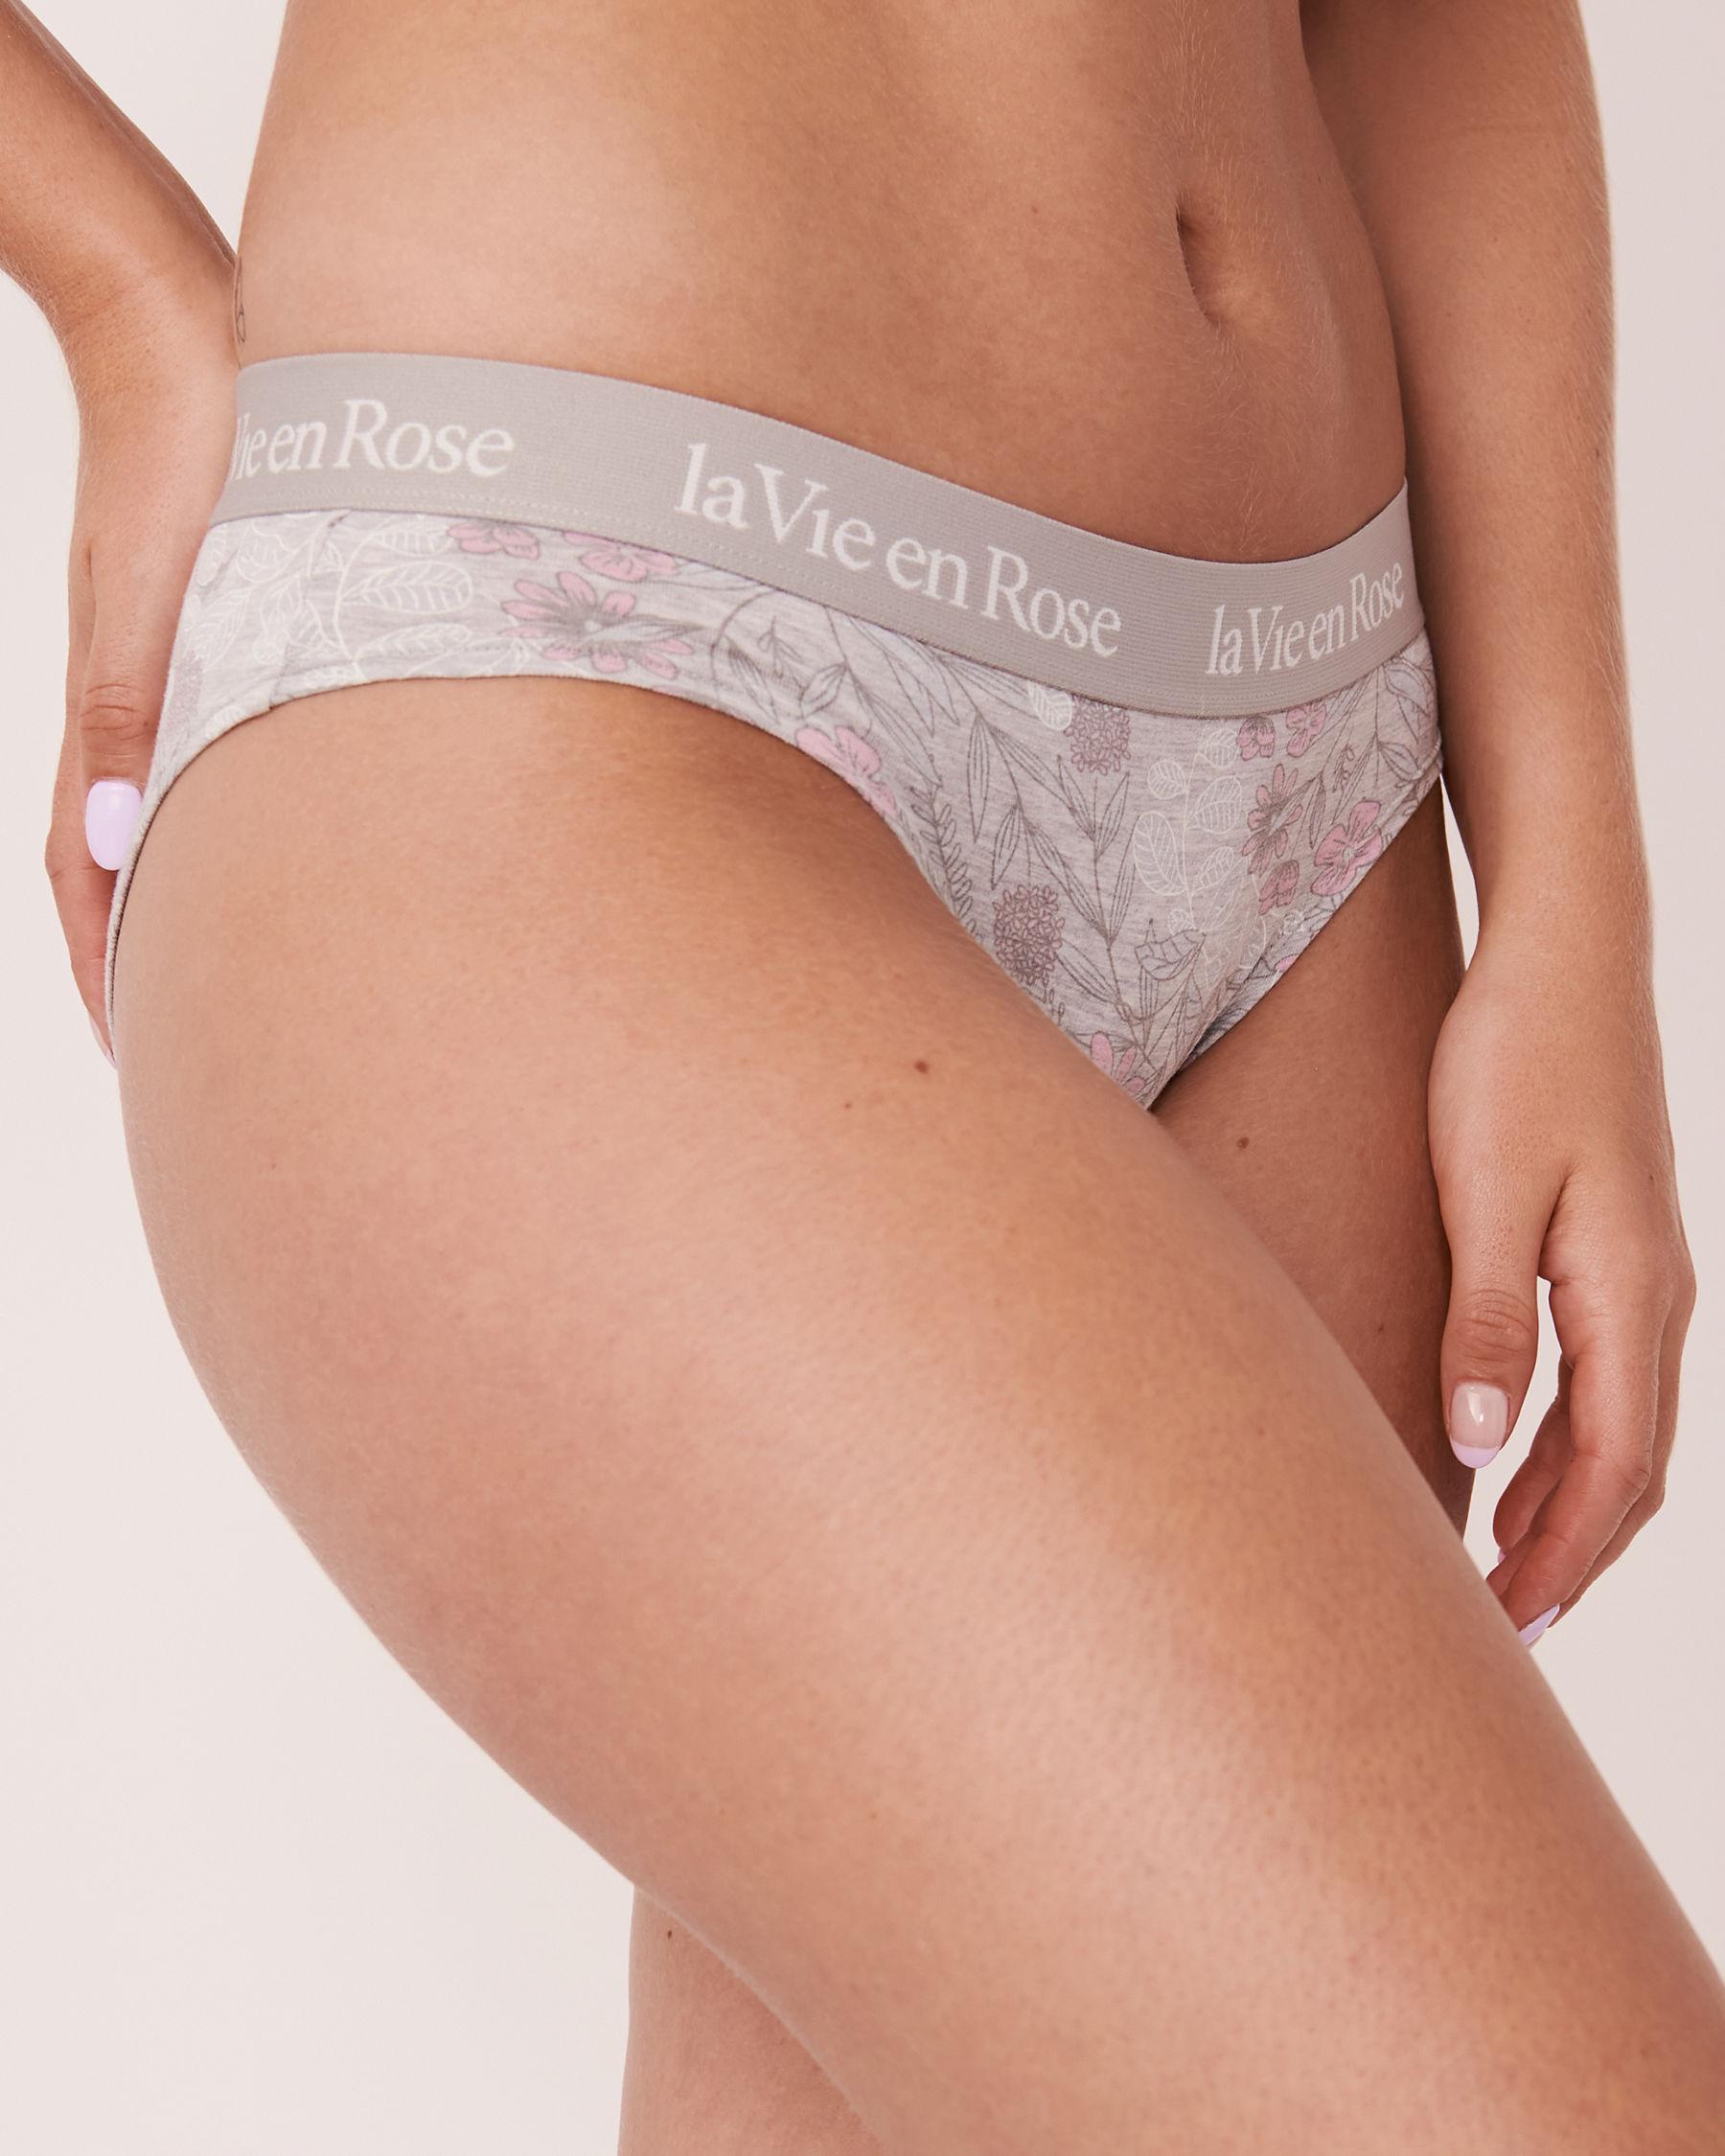 LA VIE EN ROSE Bikini Panty Leafs and flowers 20100069 - View1